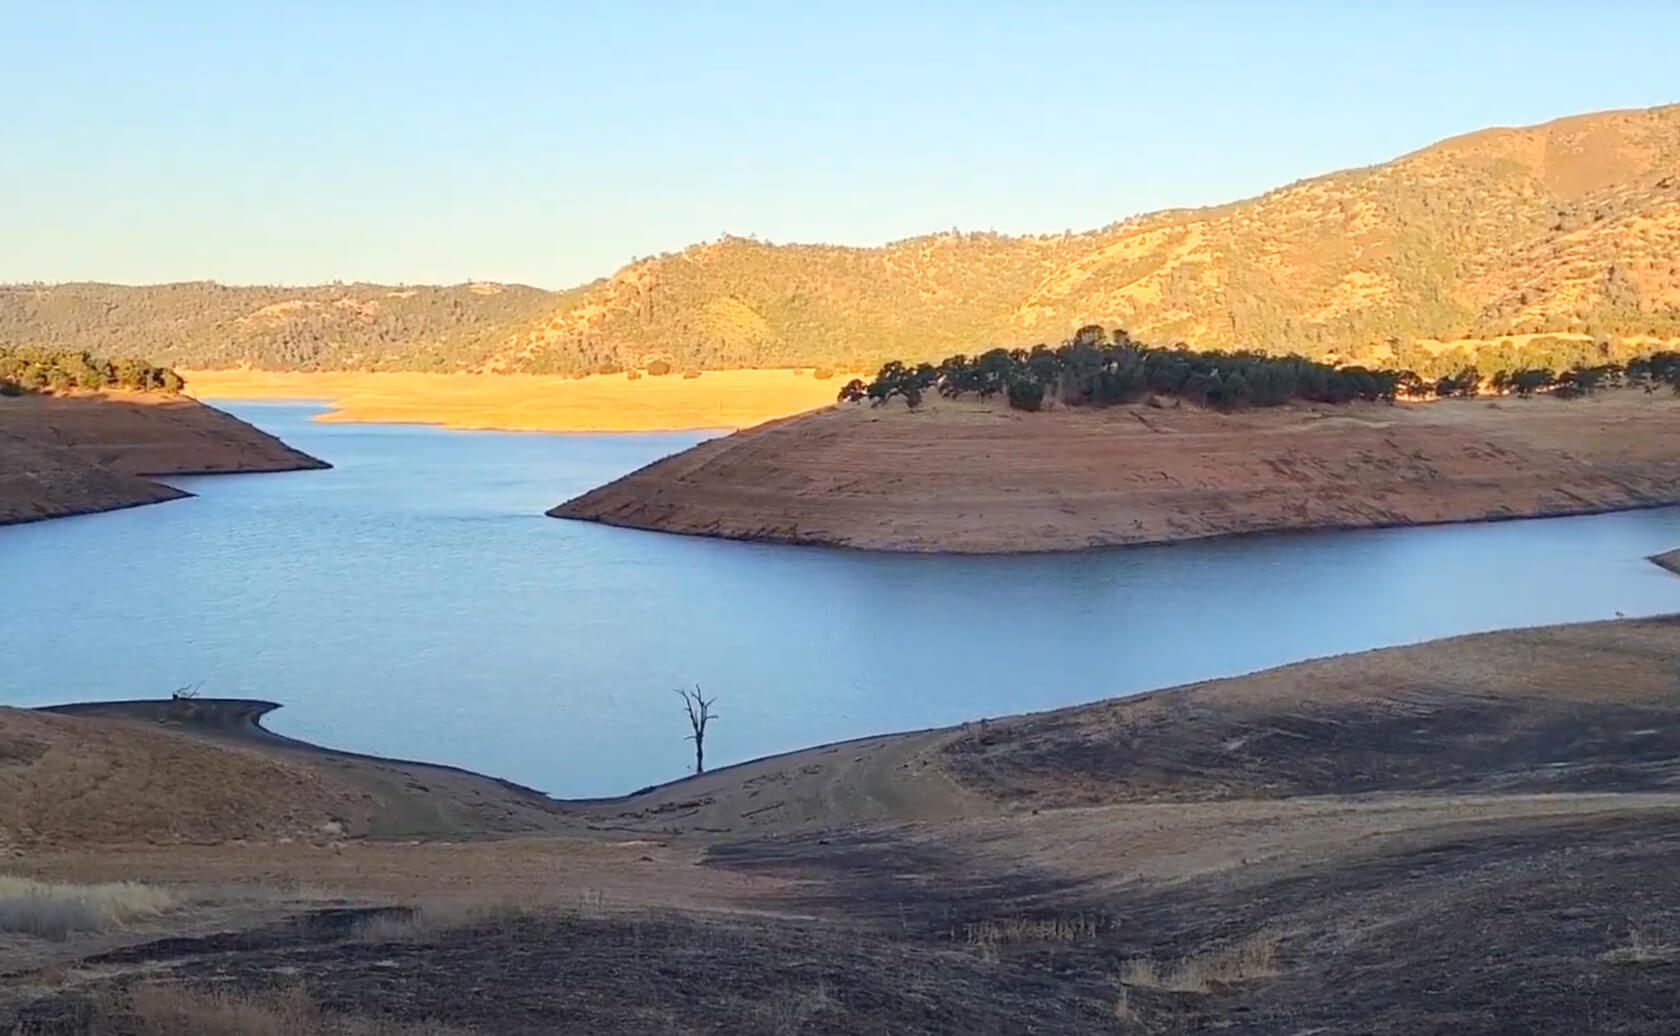 New-Melones-Lake-Fishing-Guide-Report-California-06